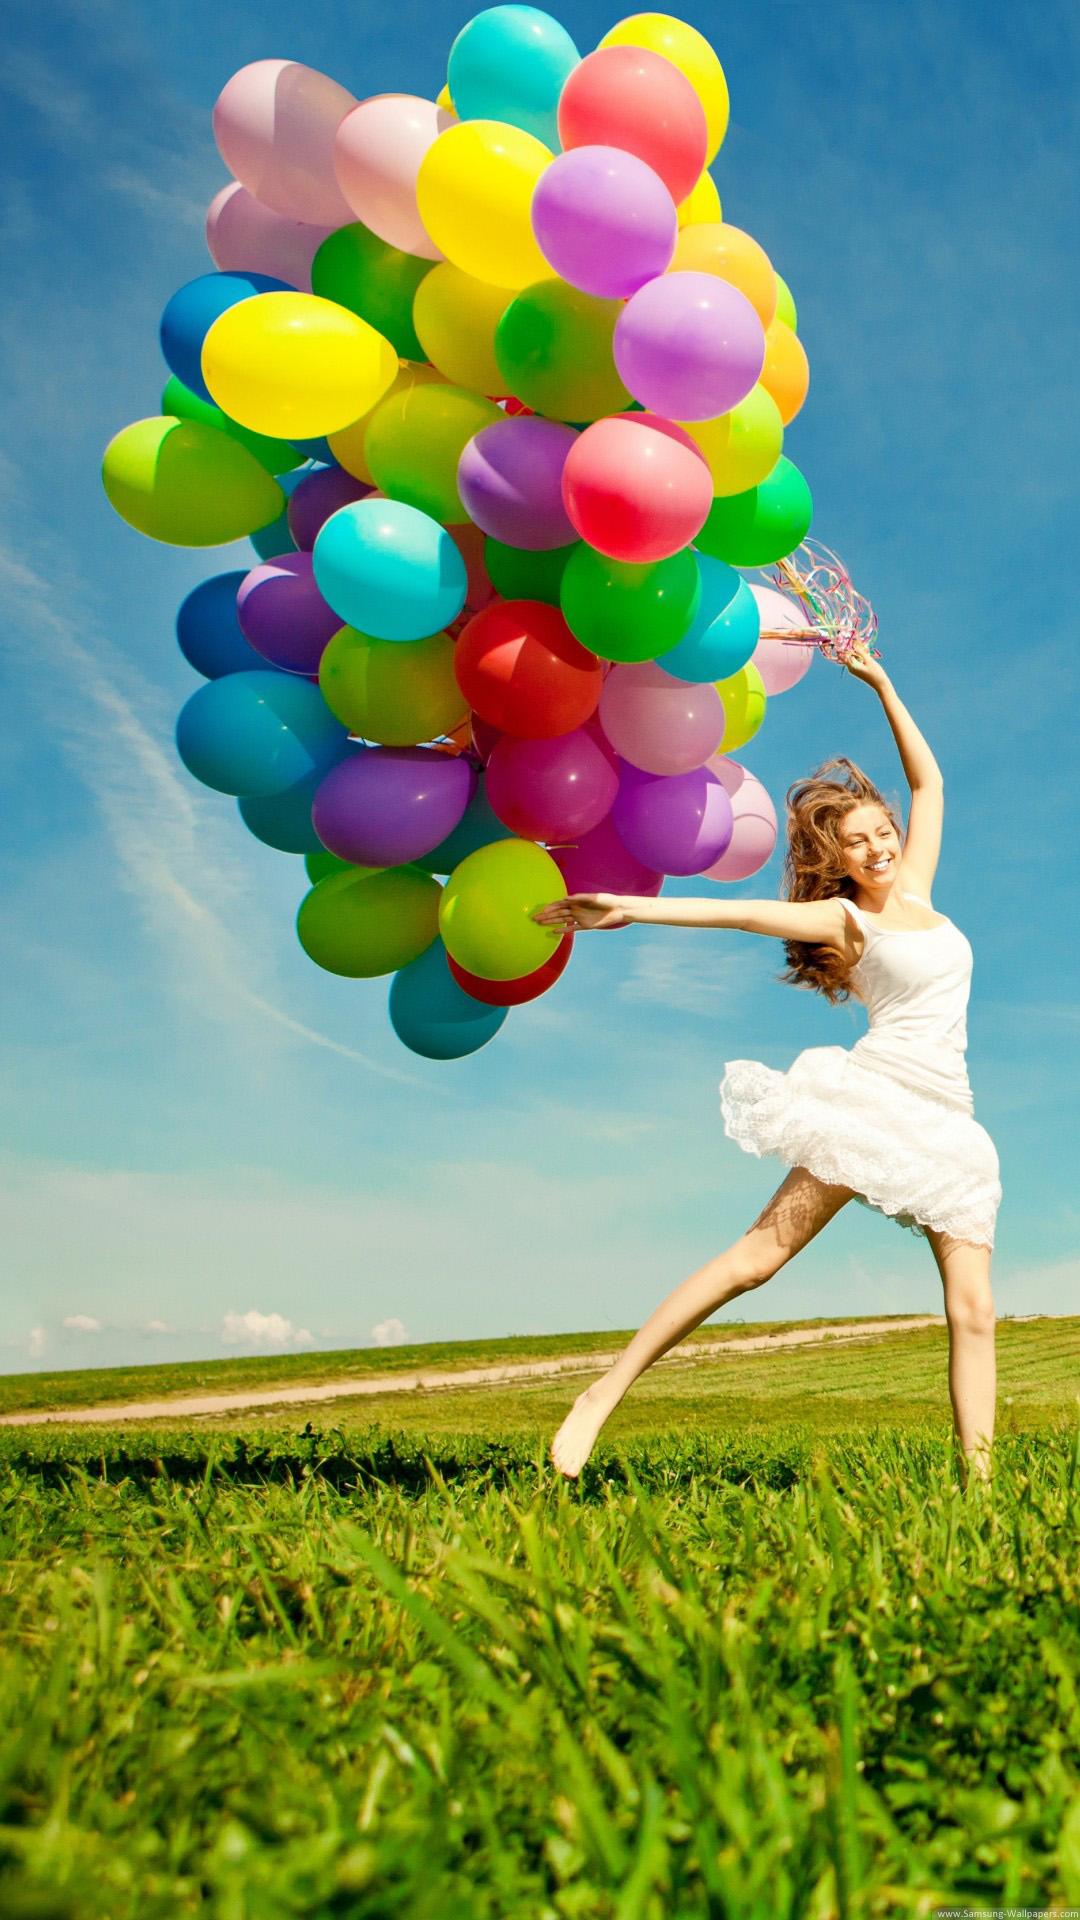 happy songs playlist - 900×900